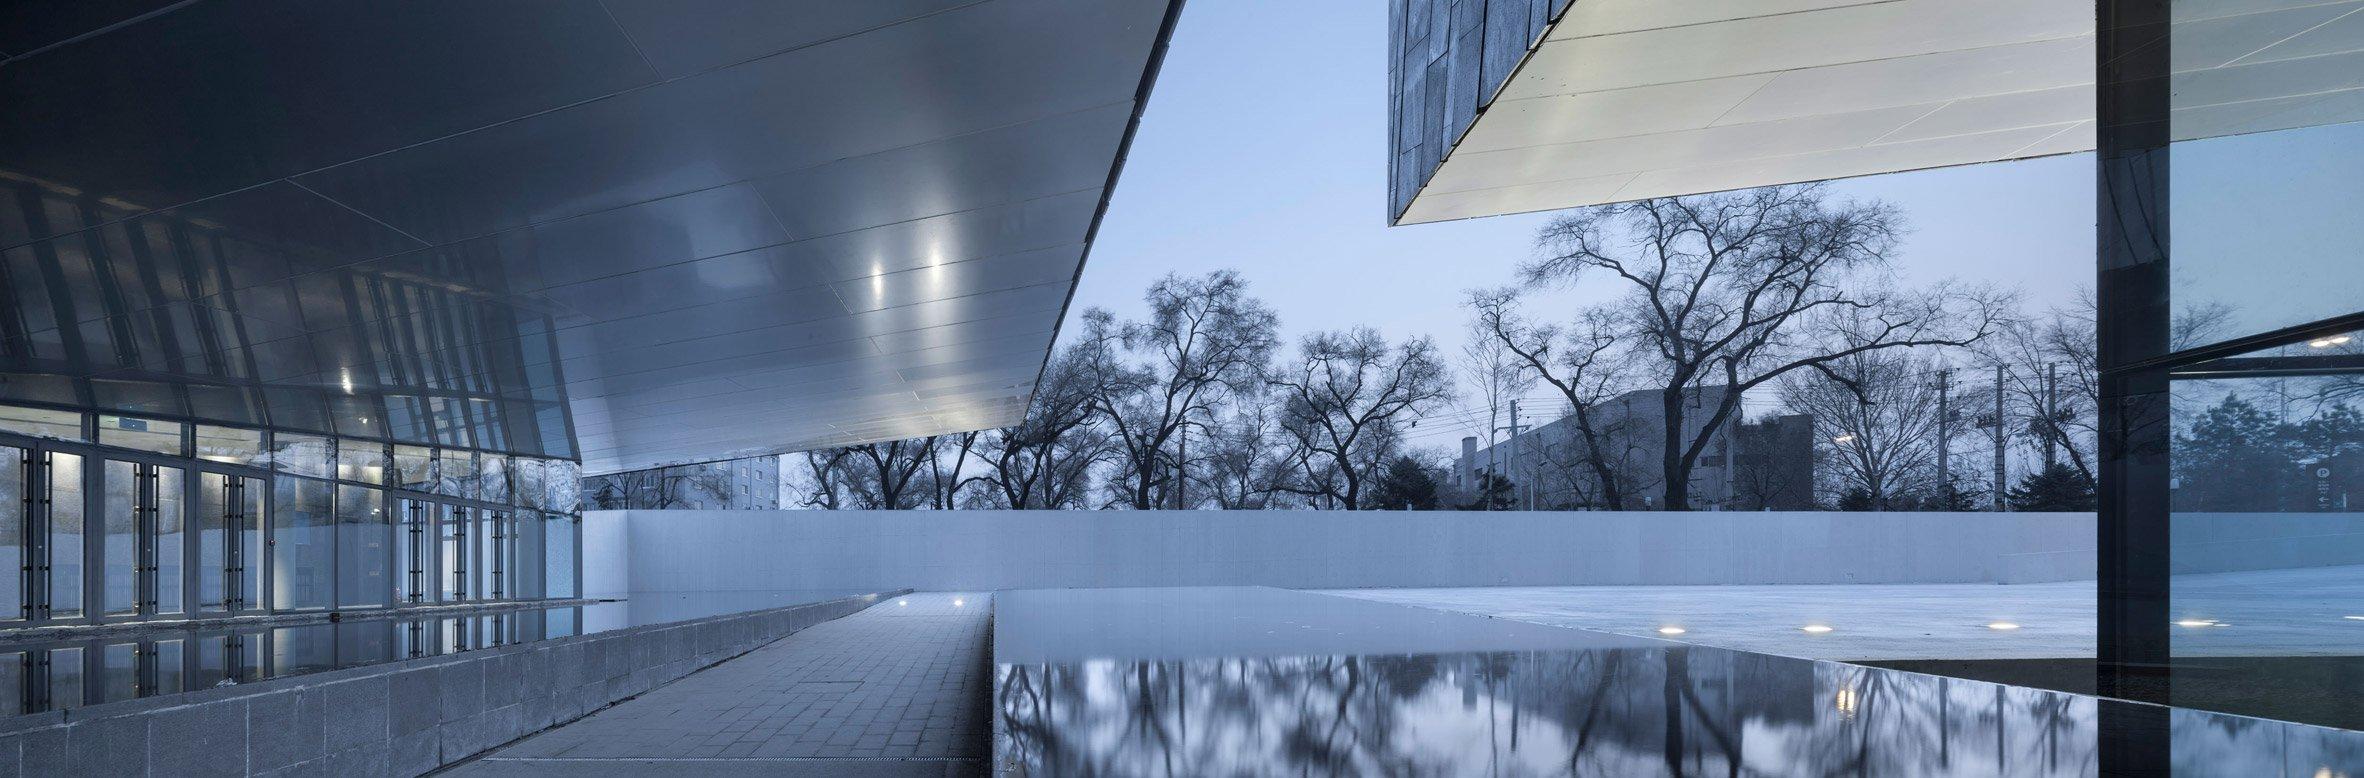 exhibition-hall-crime-evidences-harbin-he-jingtang-architecture-cultural-china_dezeen_2364_col_13.jpg